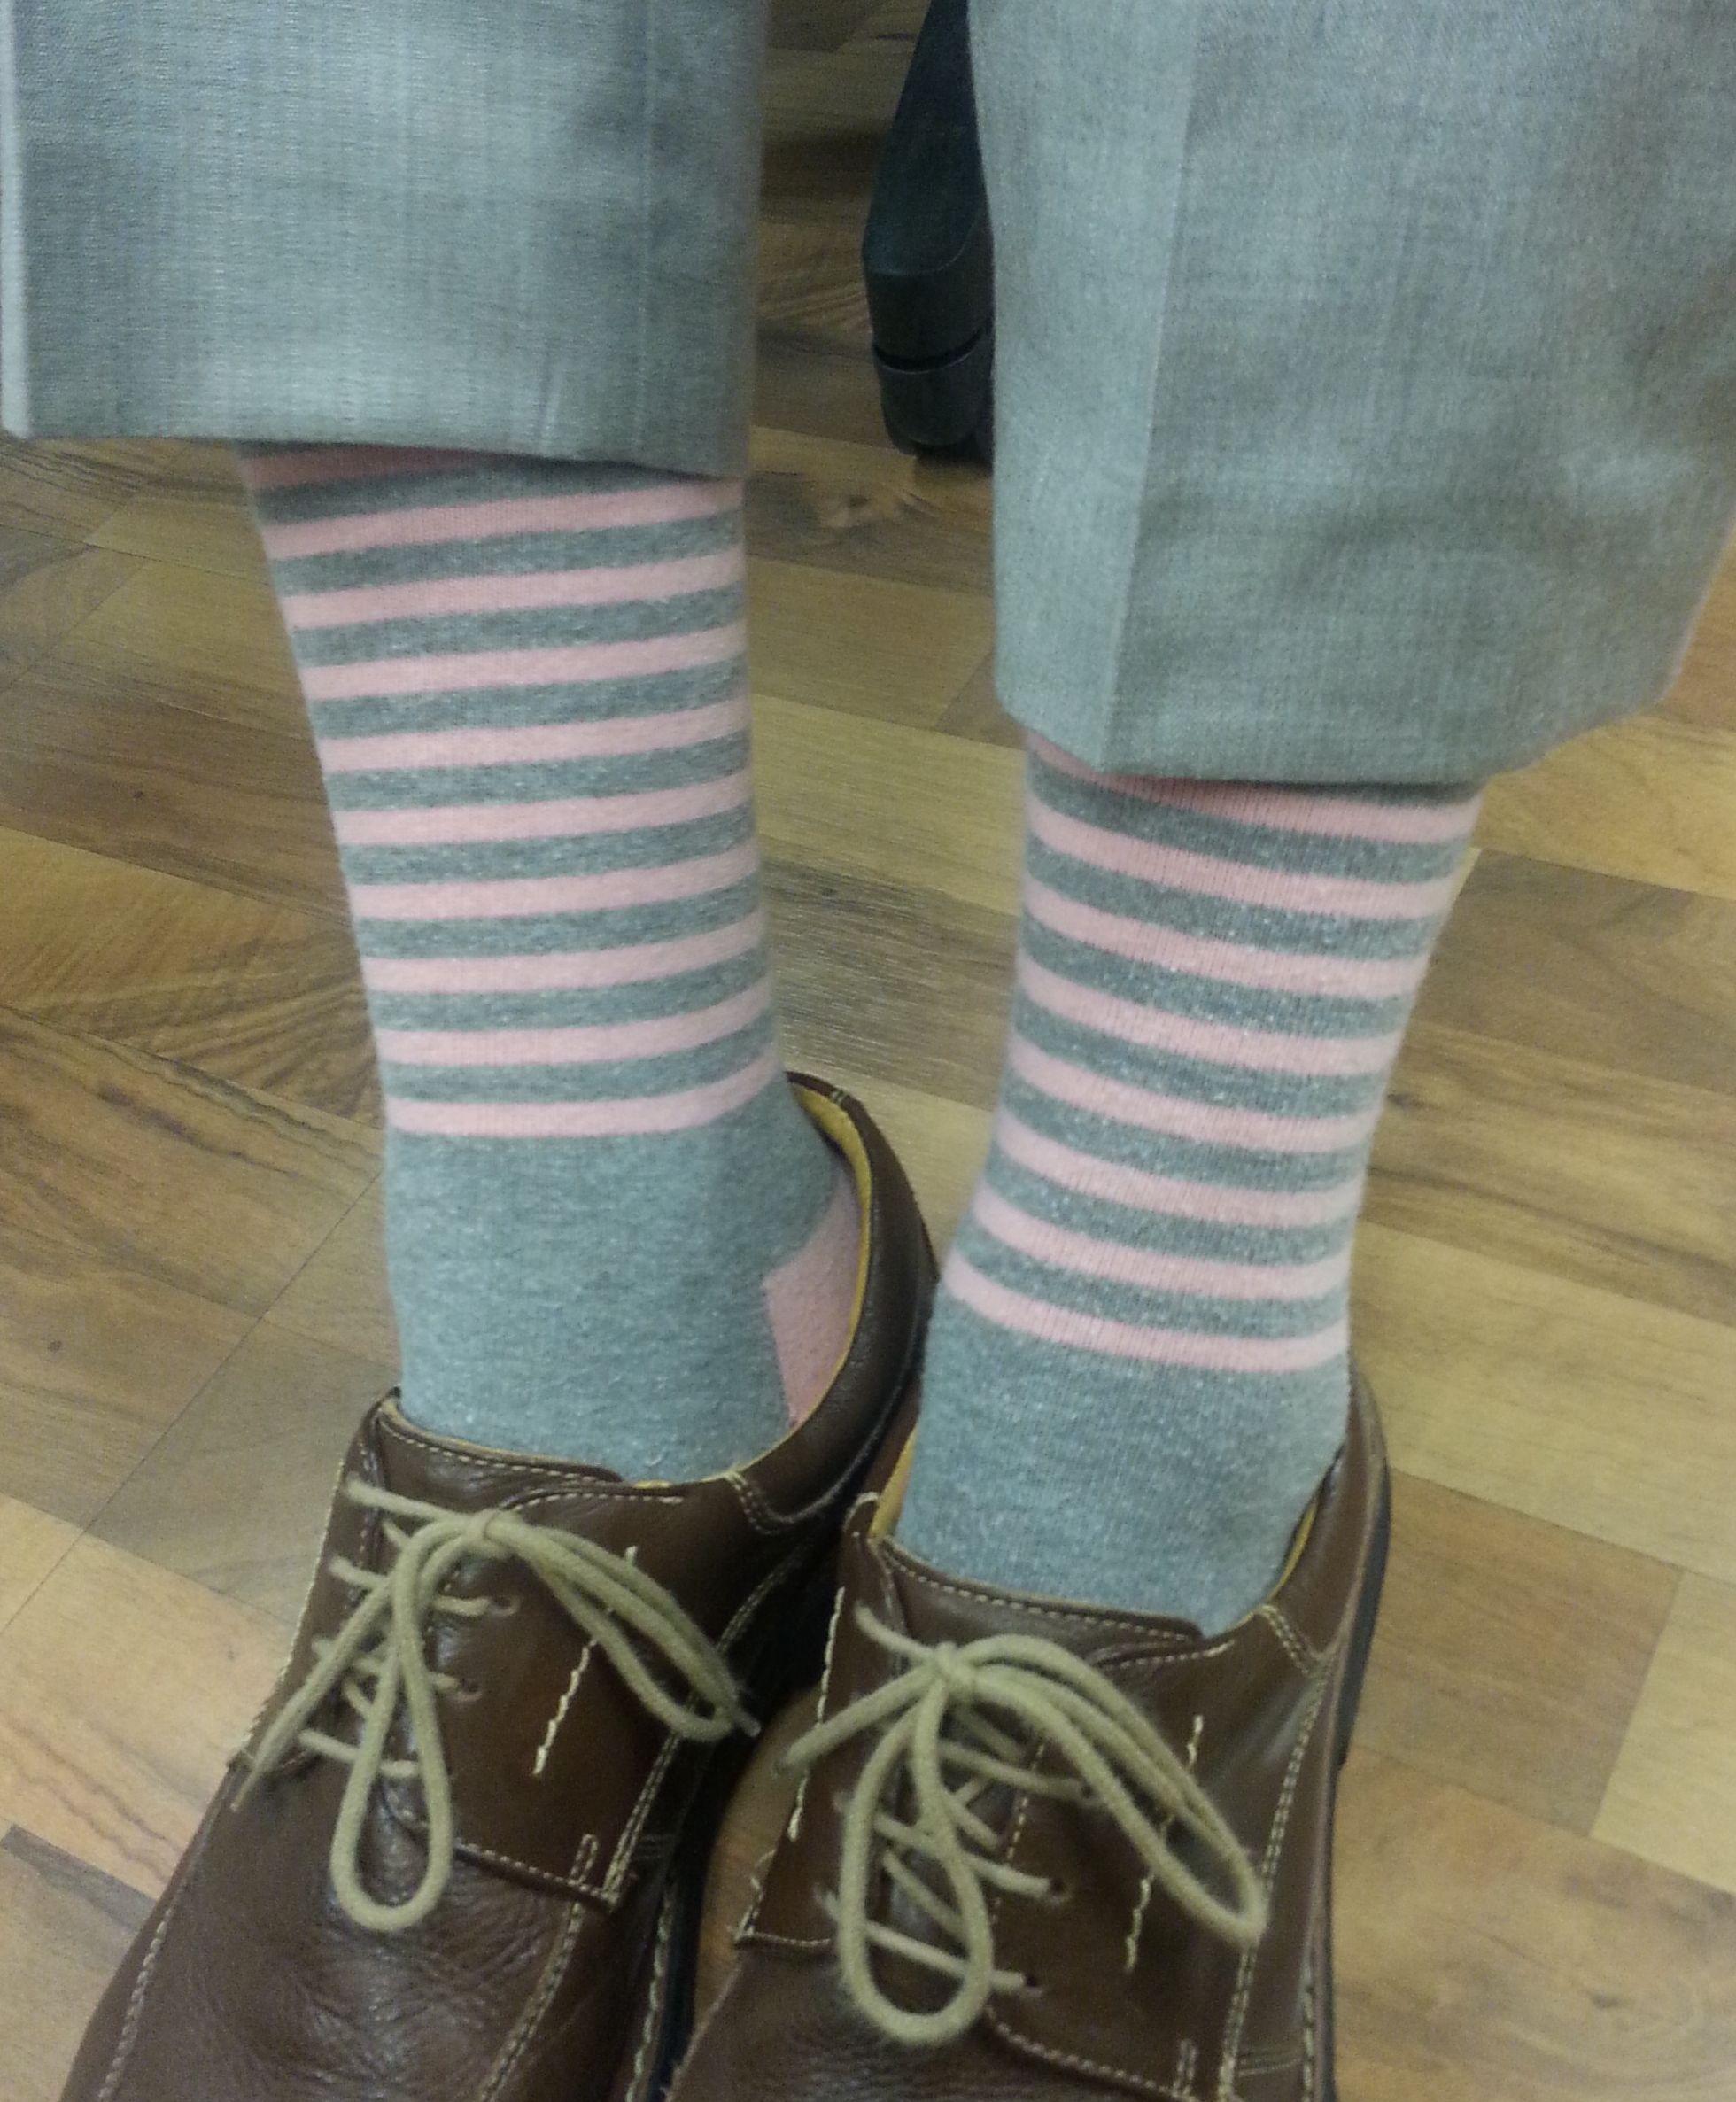 Even Jordan's socks are #pink for Breast Cancer Awareness Month! #PRA